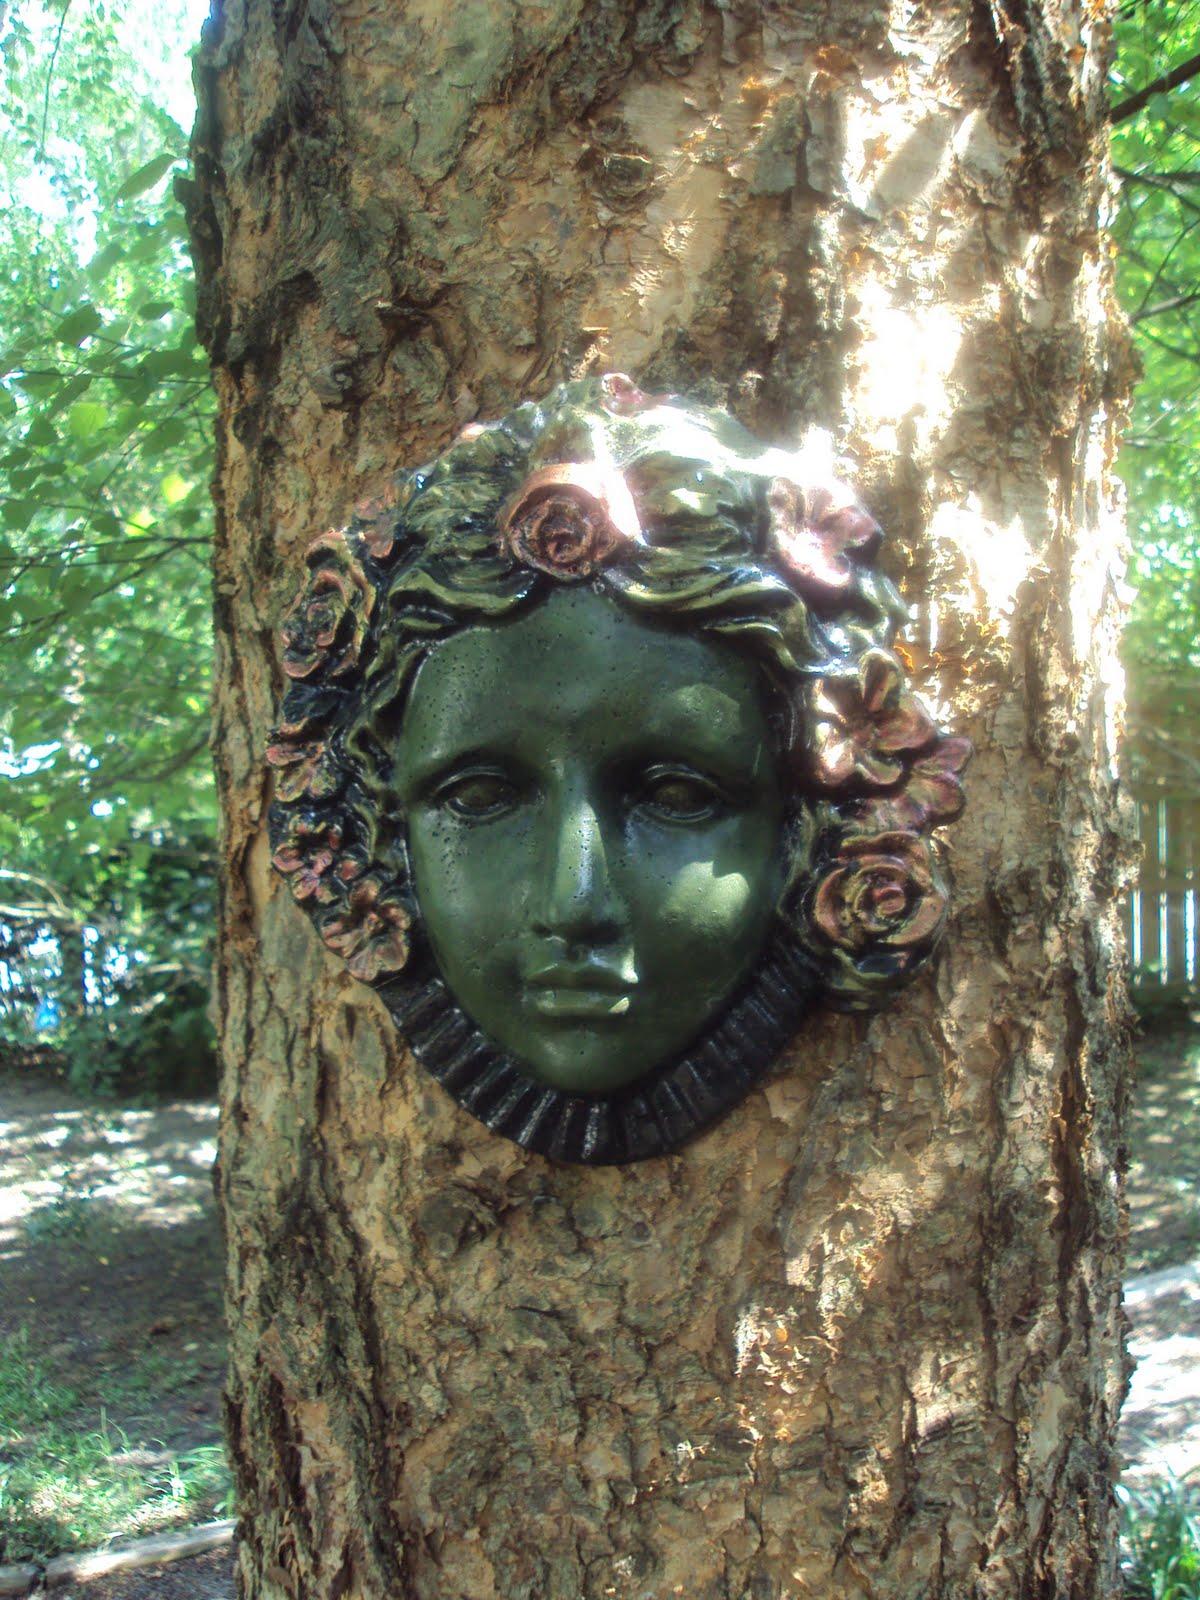 Antique Art Garden My Garden Lady Face On My Tree